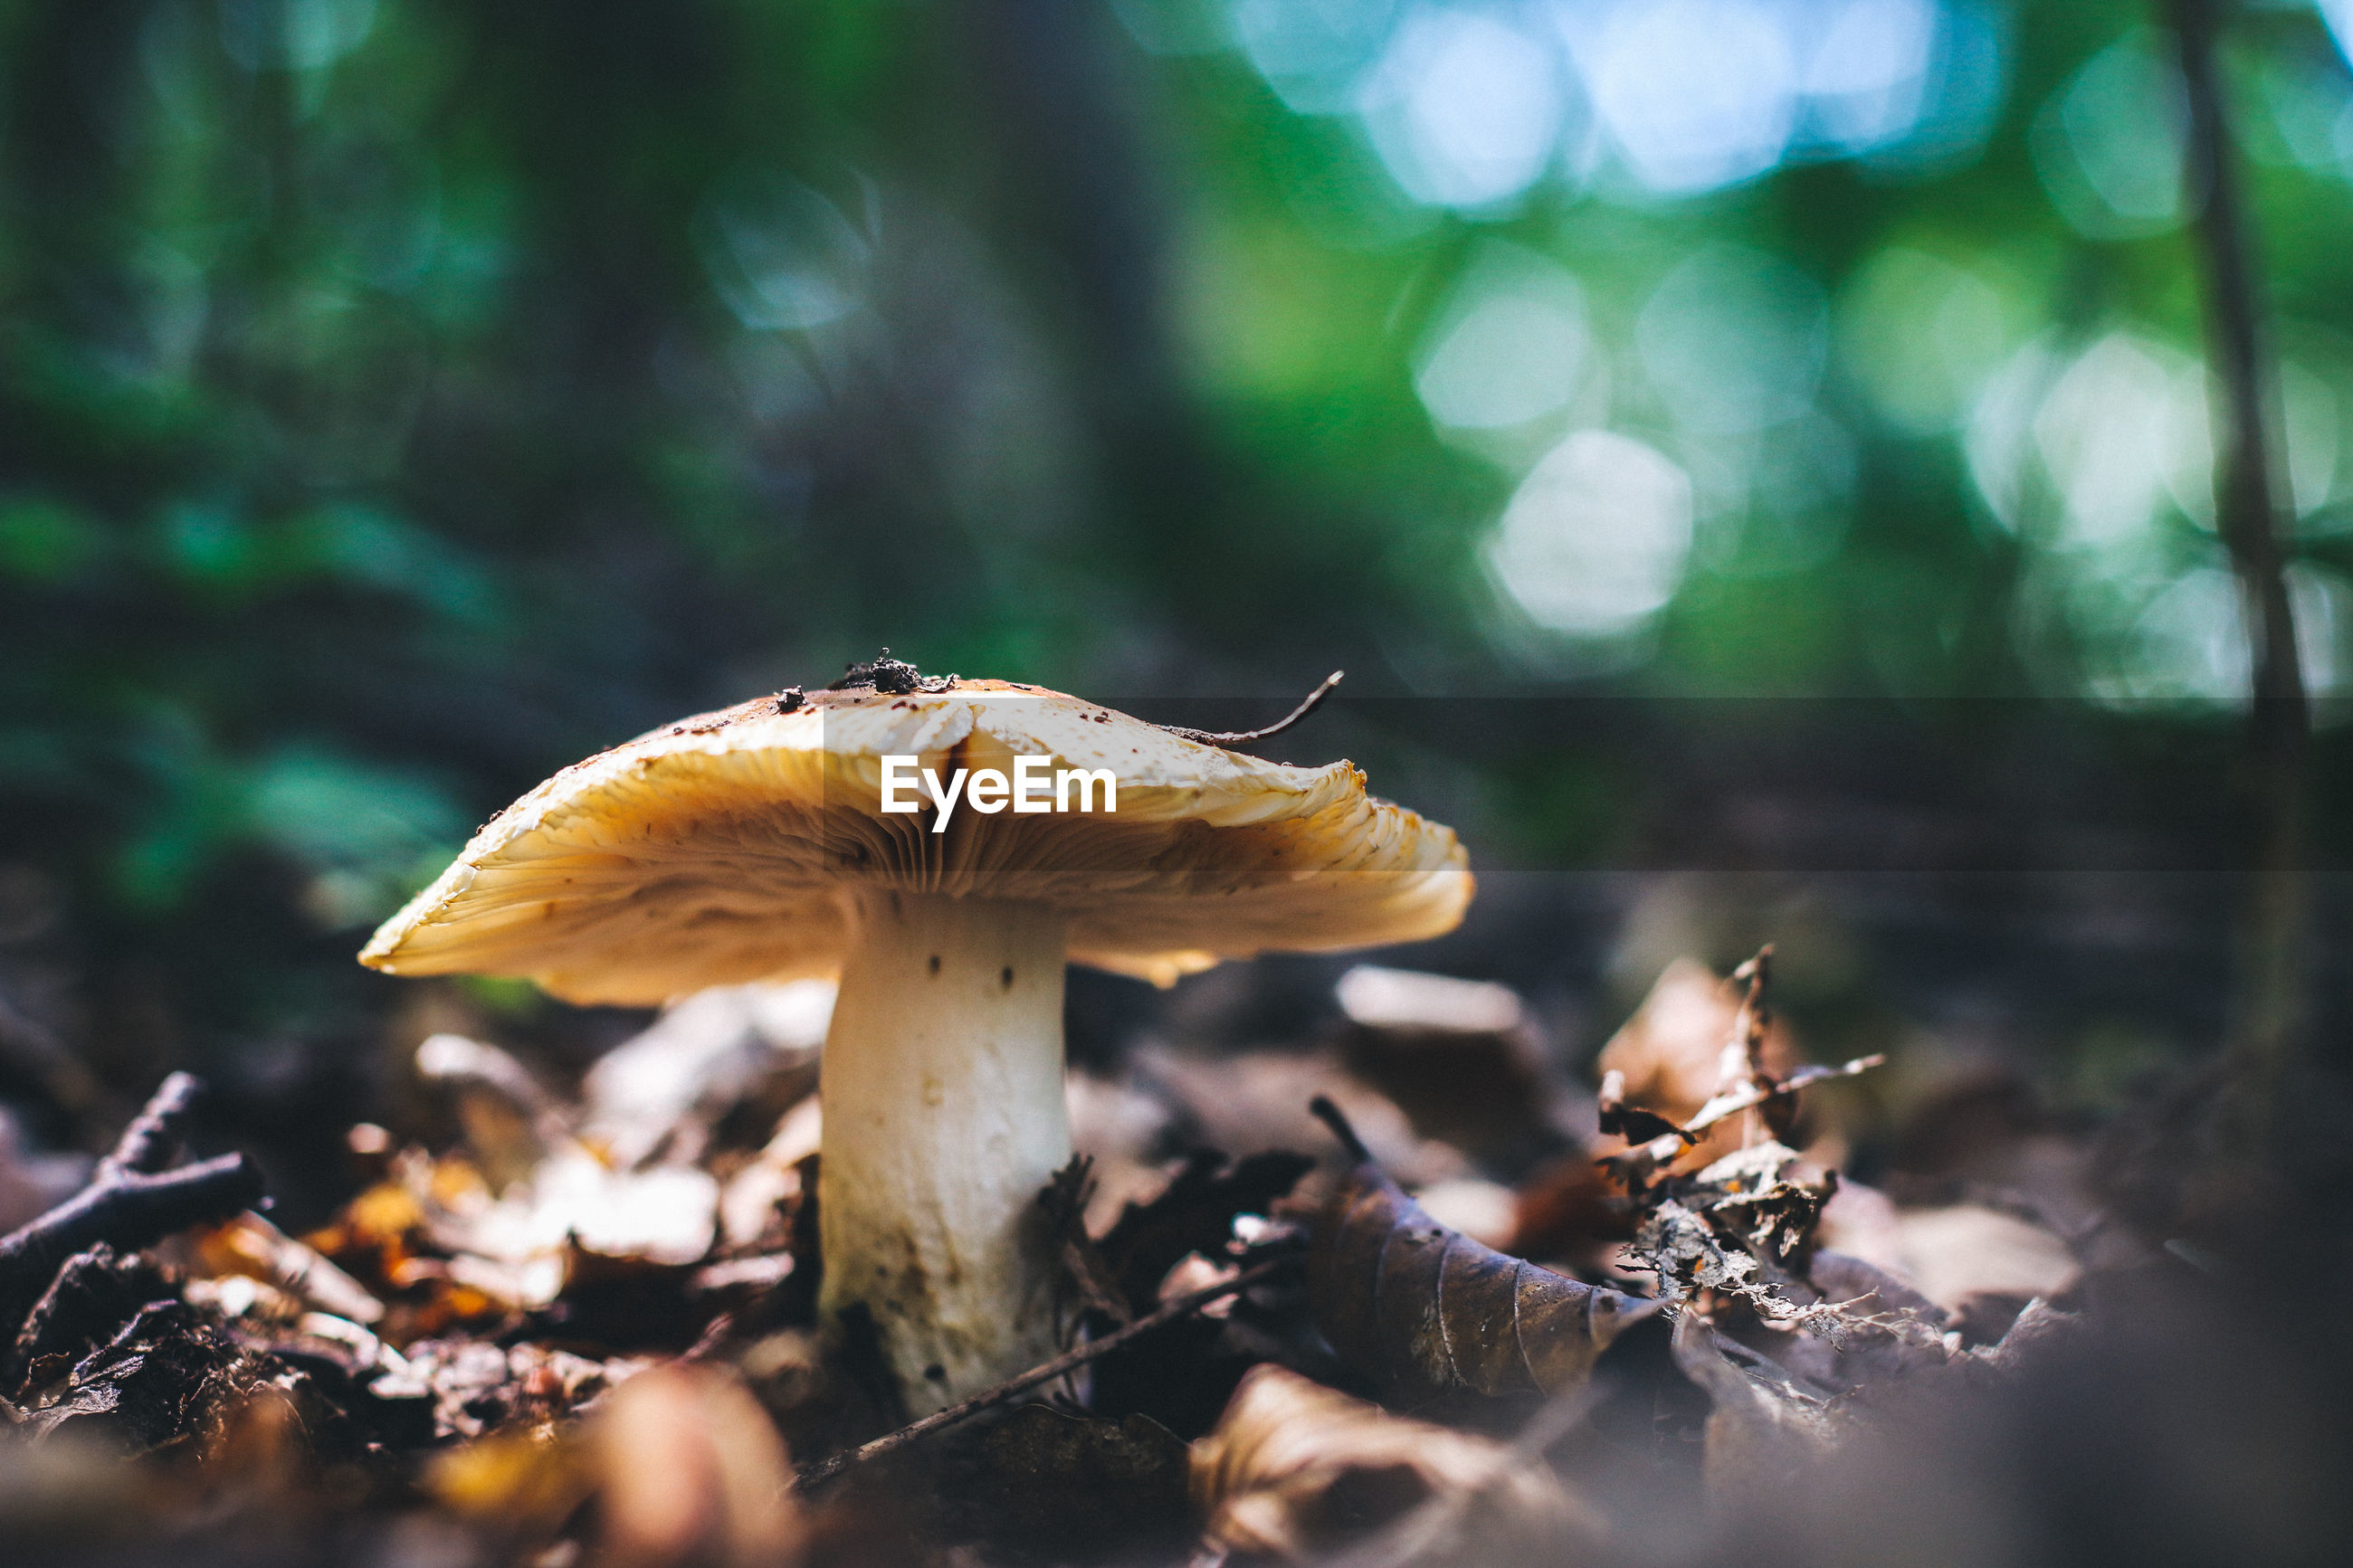 Surface level of mushroom against blurred background